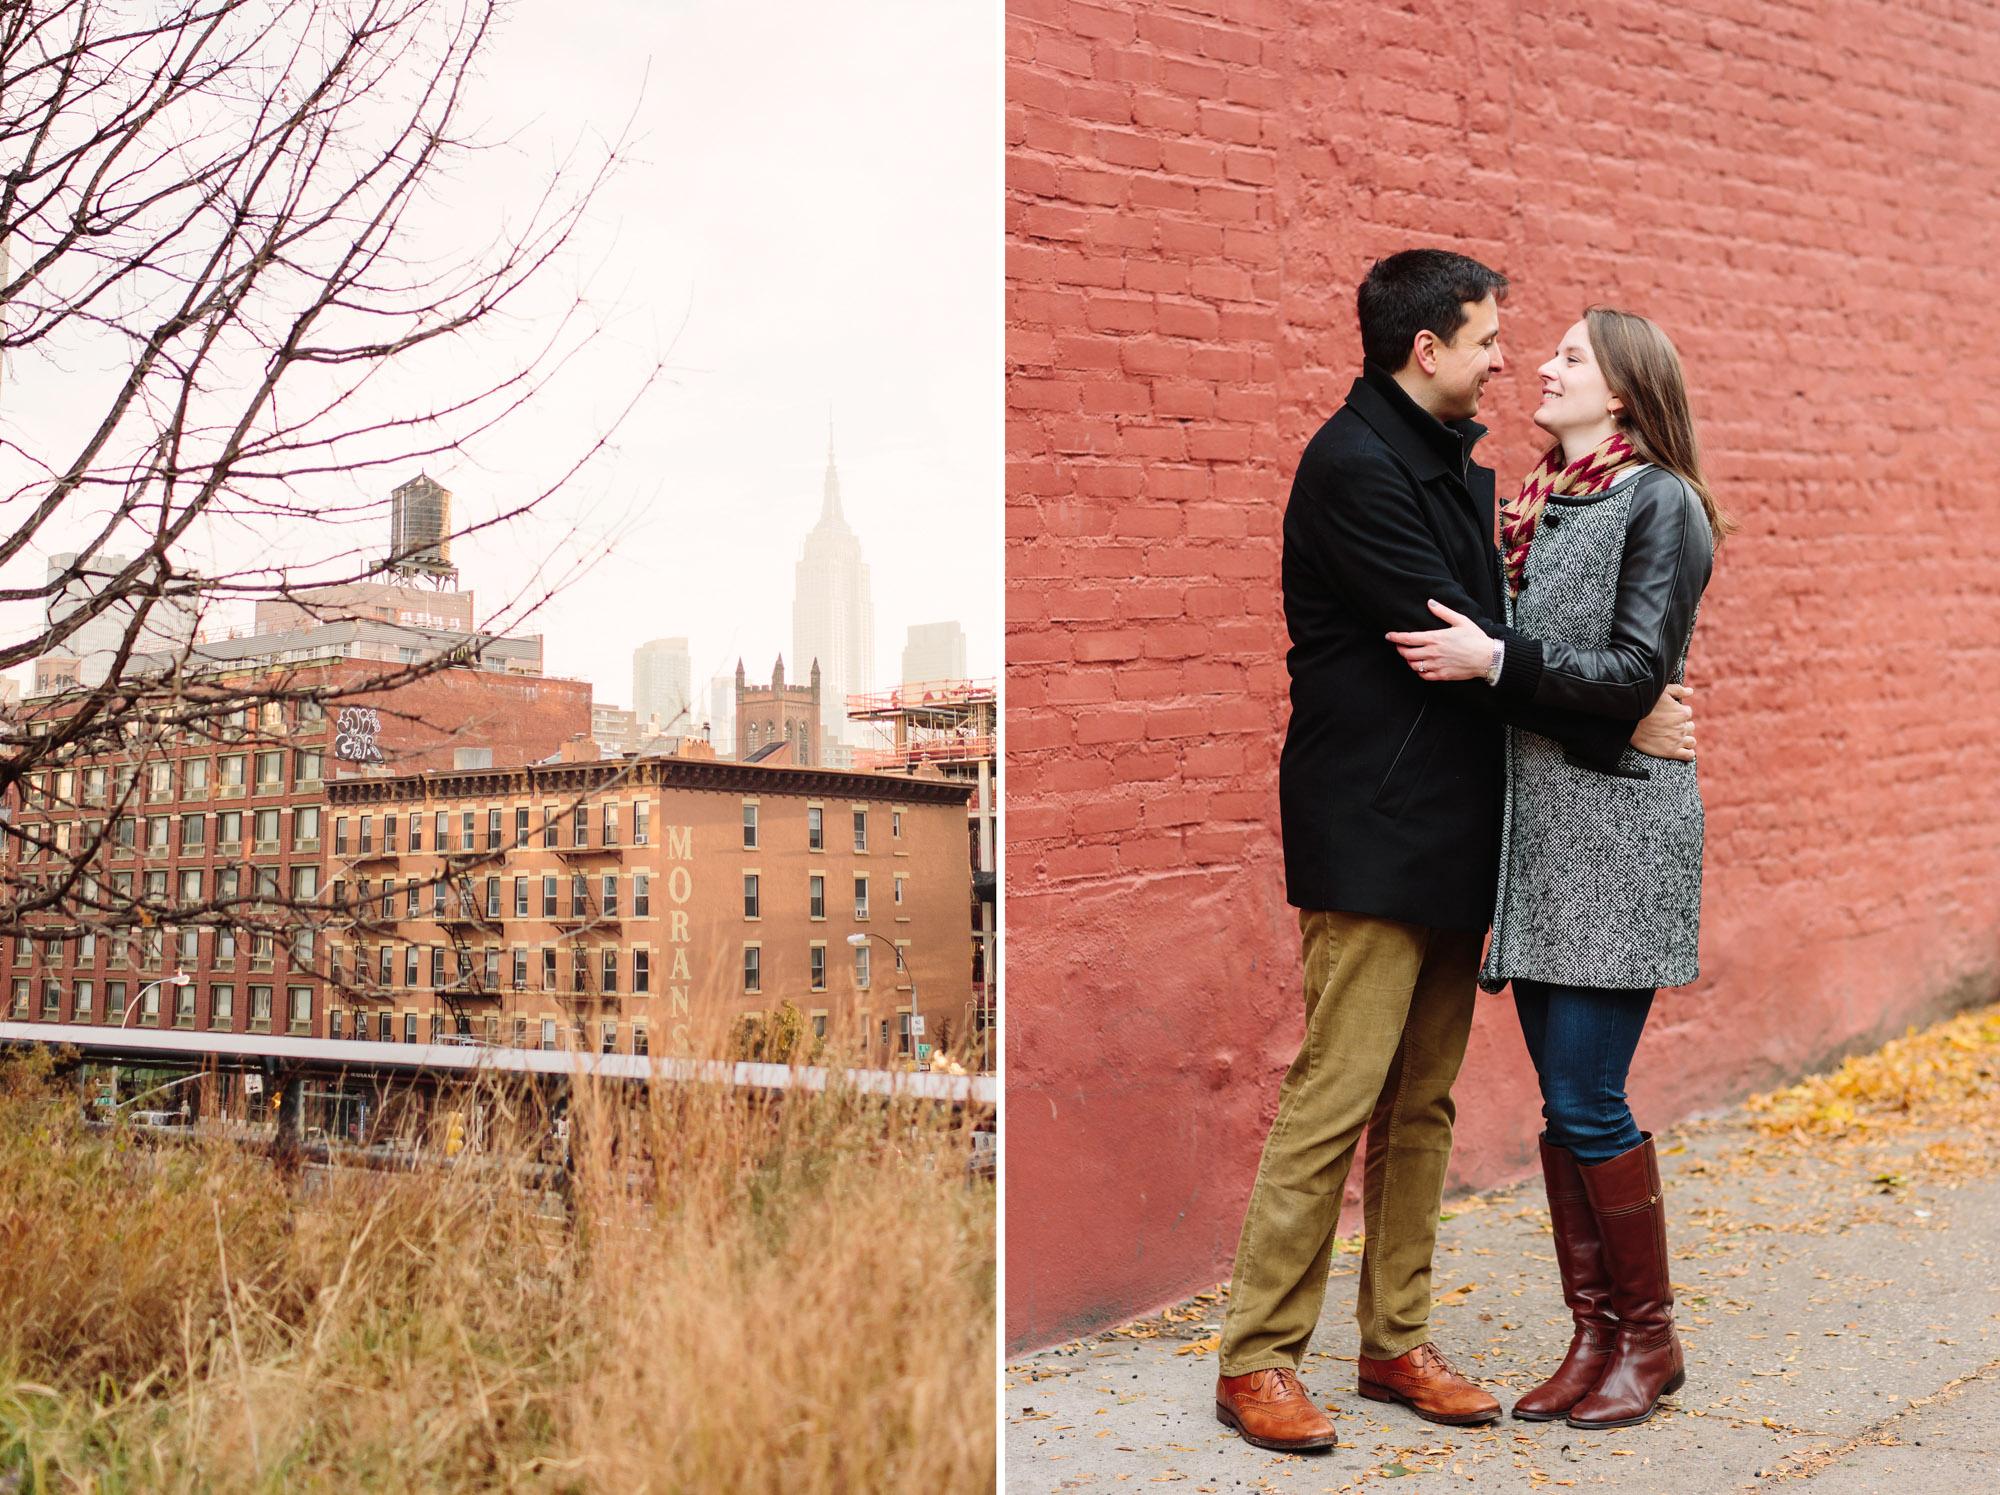 09_Sarah_Rob_The_Highline_New_York_City_Engagement_Photos.jpg